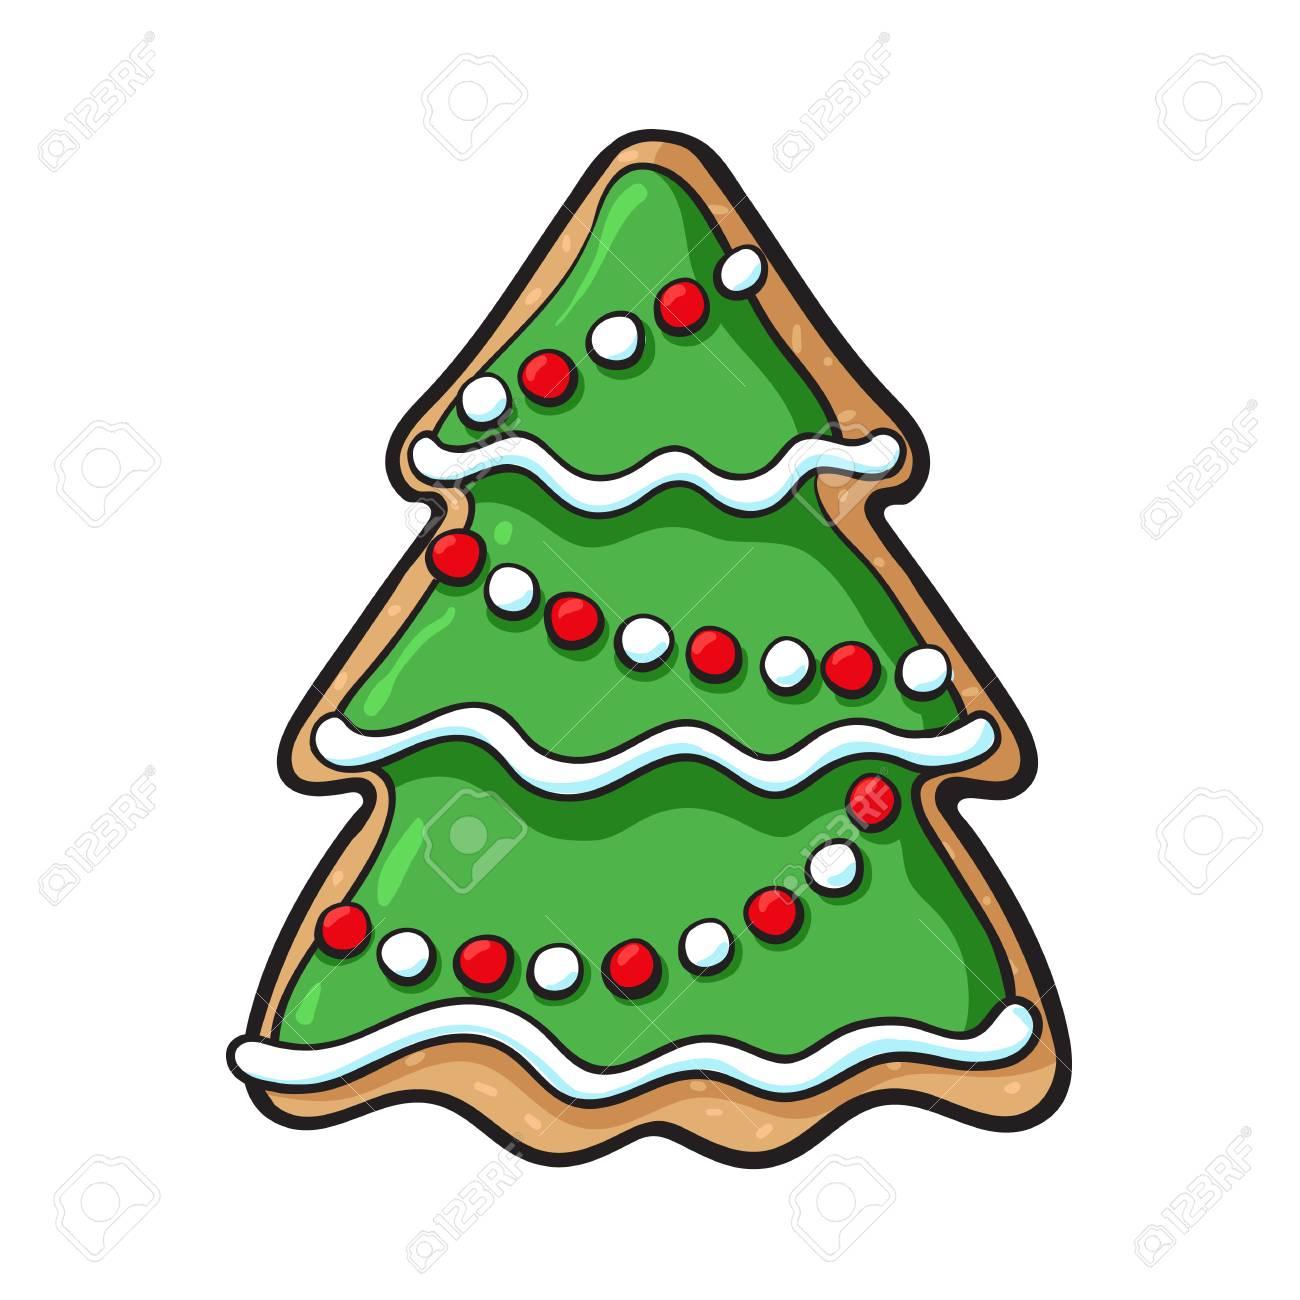 Gingerbread Christmas Tree.Glazed Homemade Christmas Tree Gingerbread Cookie Sketch Style